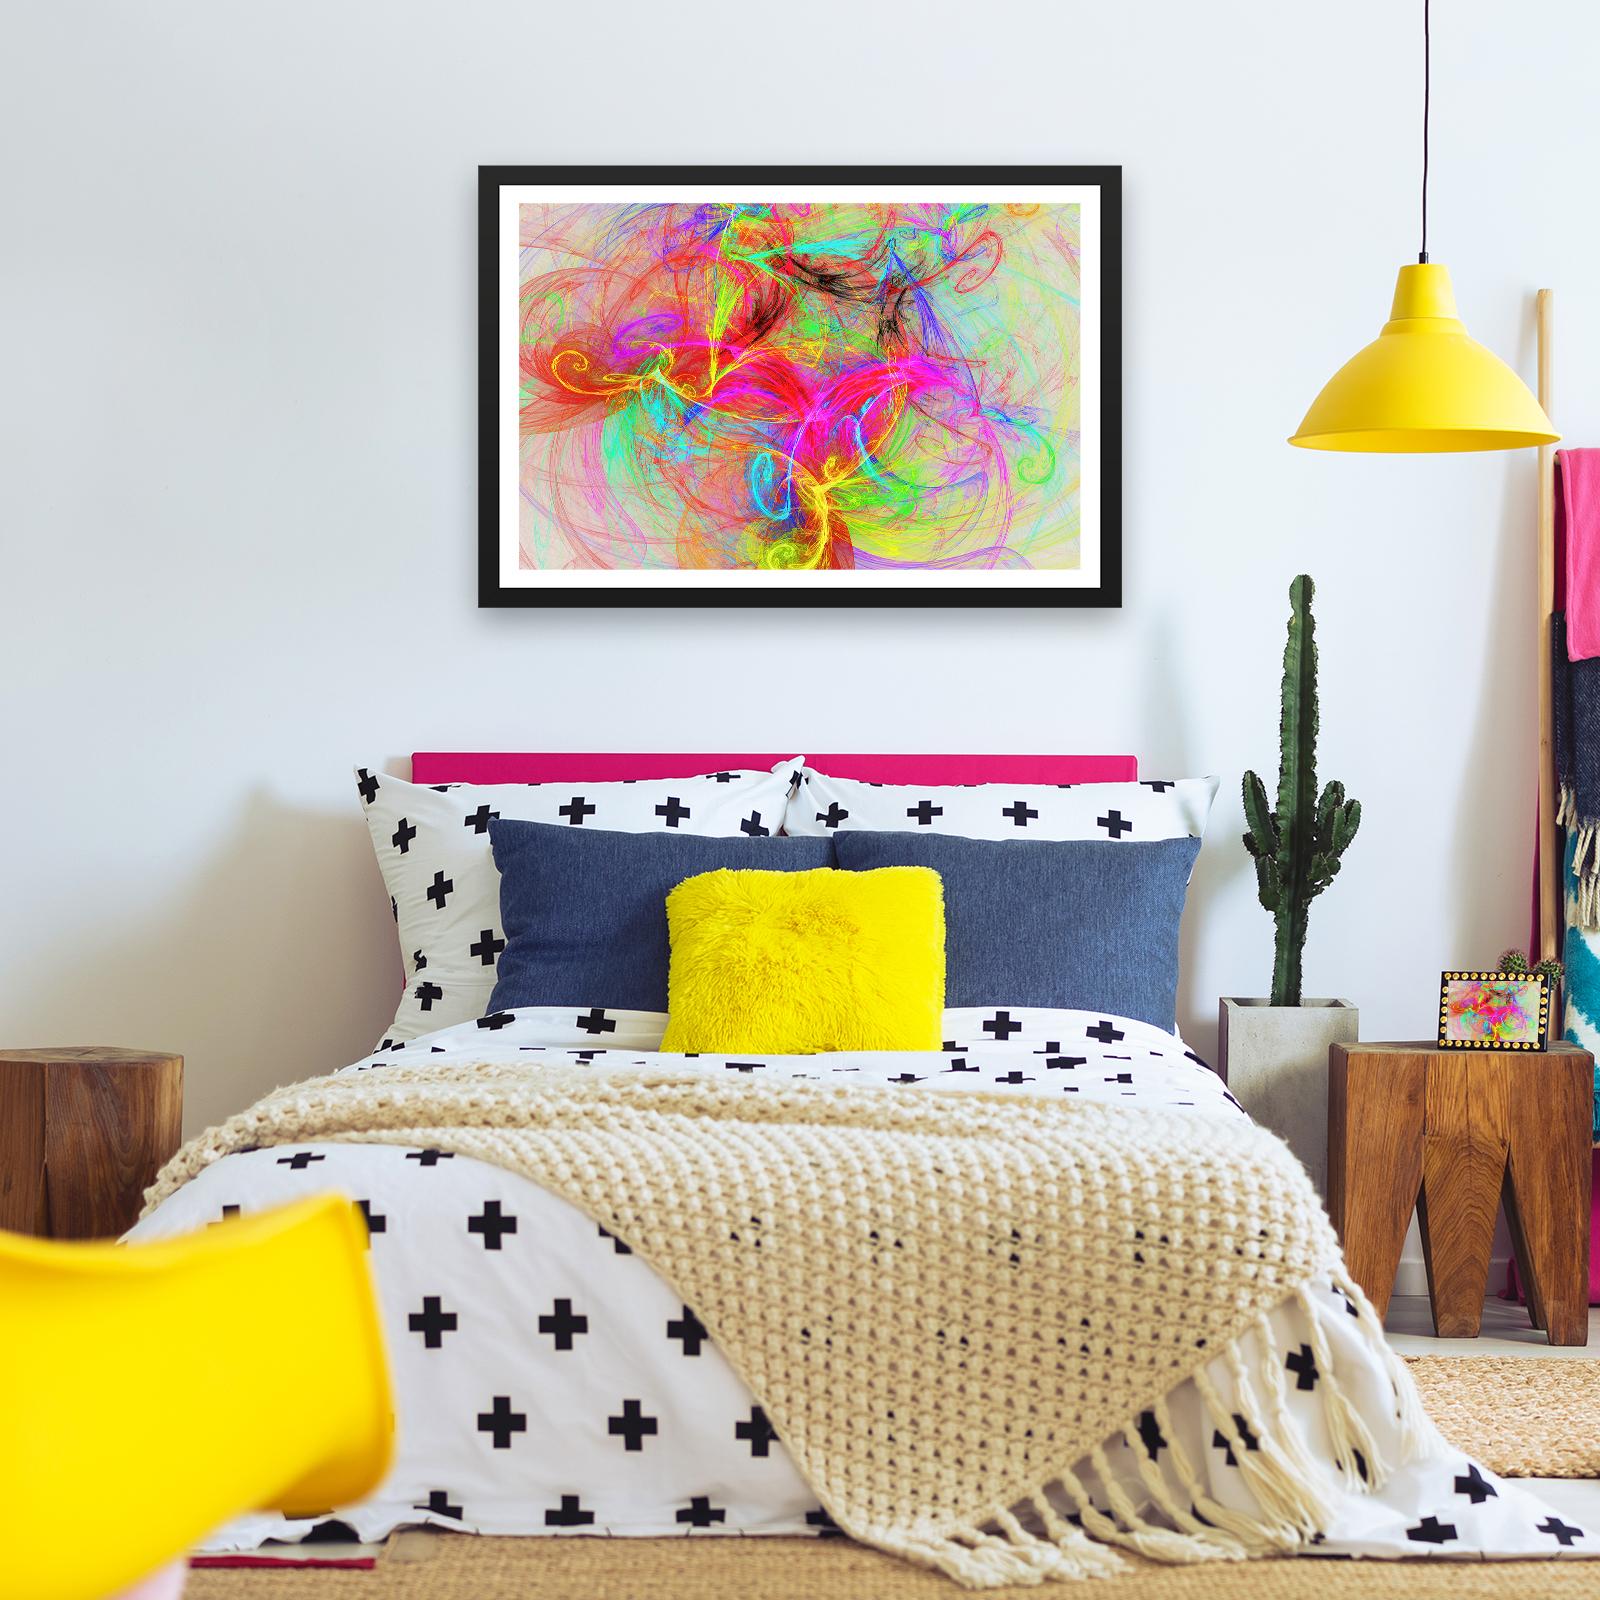 BF2AB1764 RETRO BUNT Cool moderne abstrakte gerahmte Wand-Kunst-Bild ...